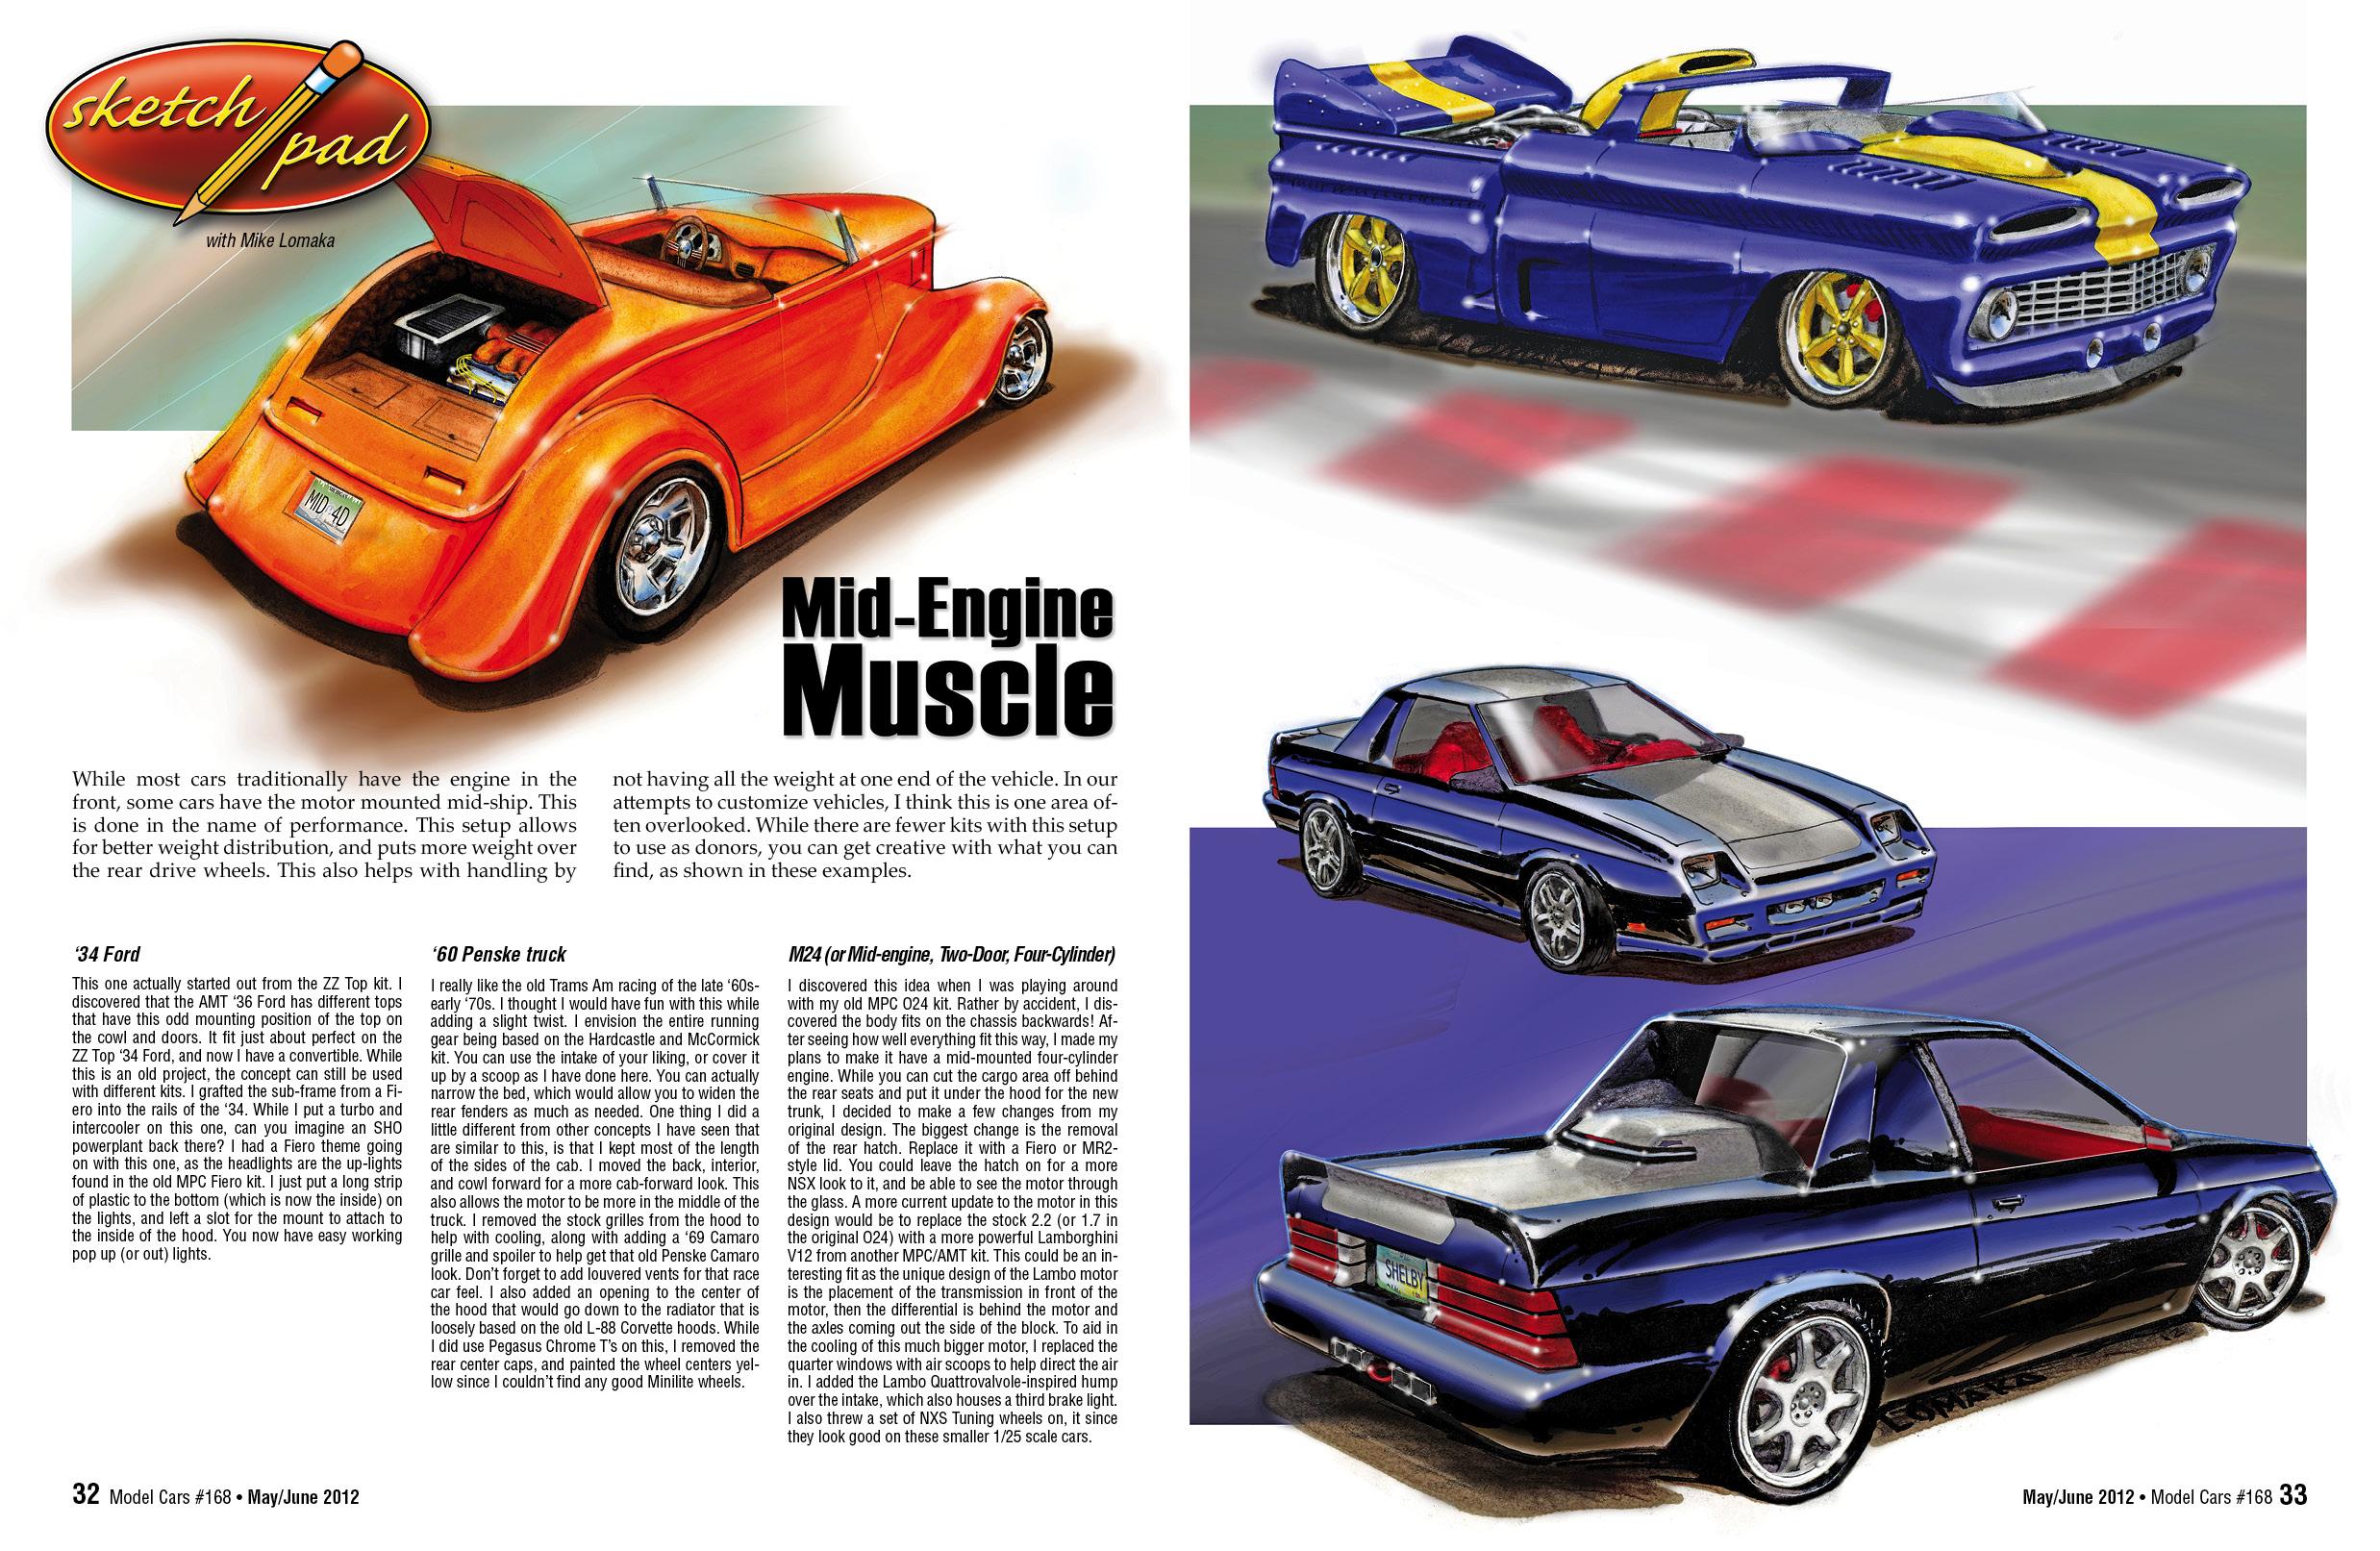 RC Model Cars Magazine Radio Tips Jac-Rabbit Racer December 1985 073117nonrh